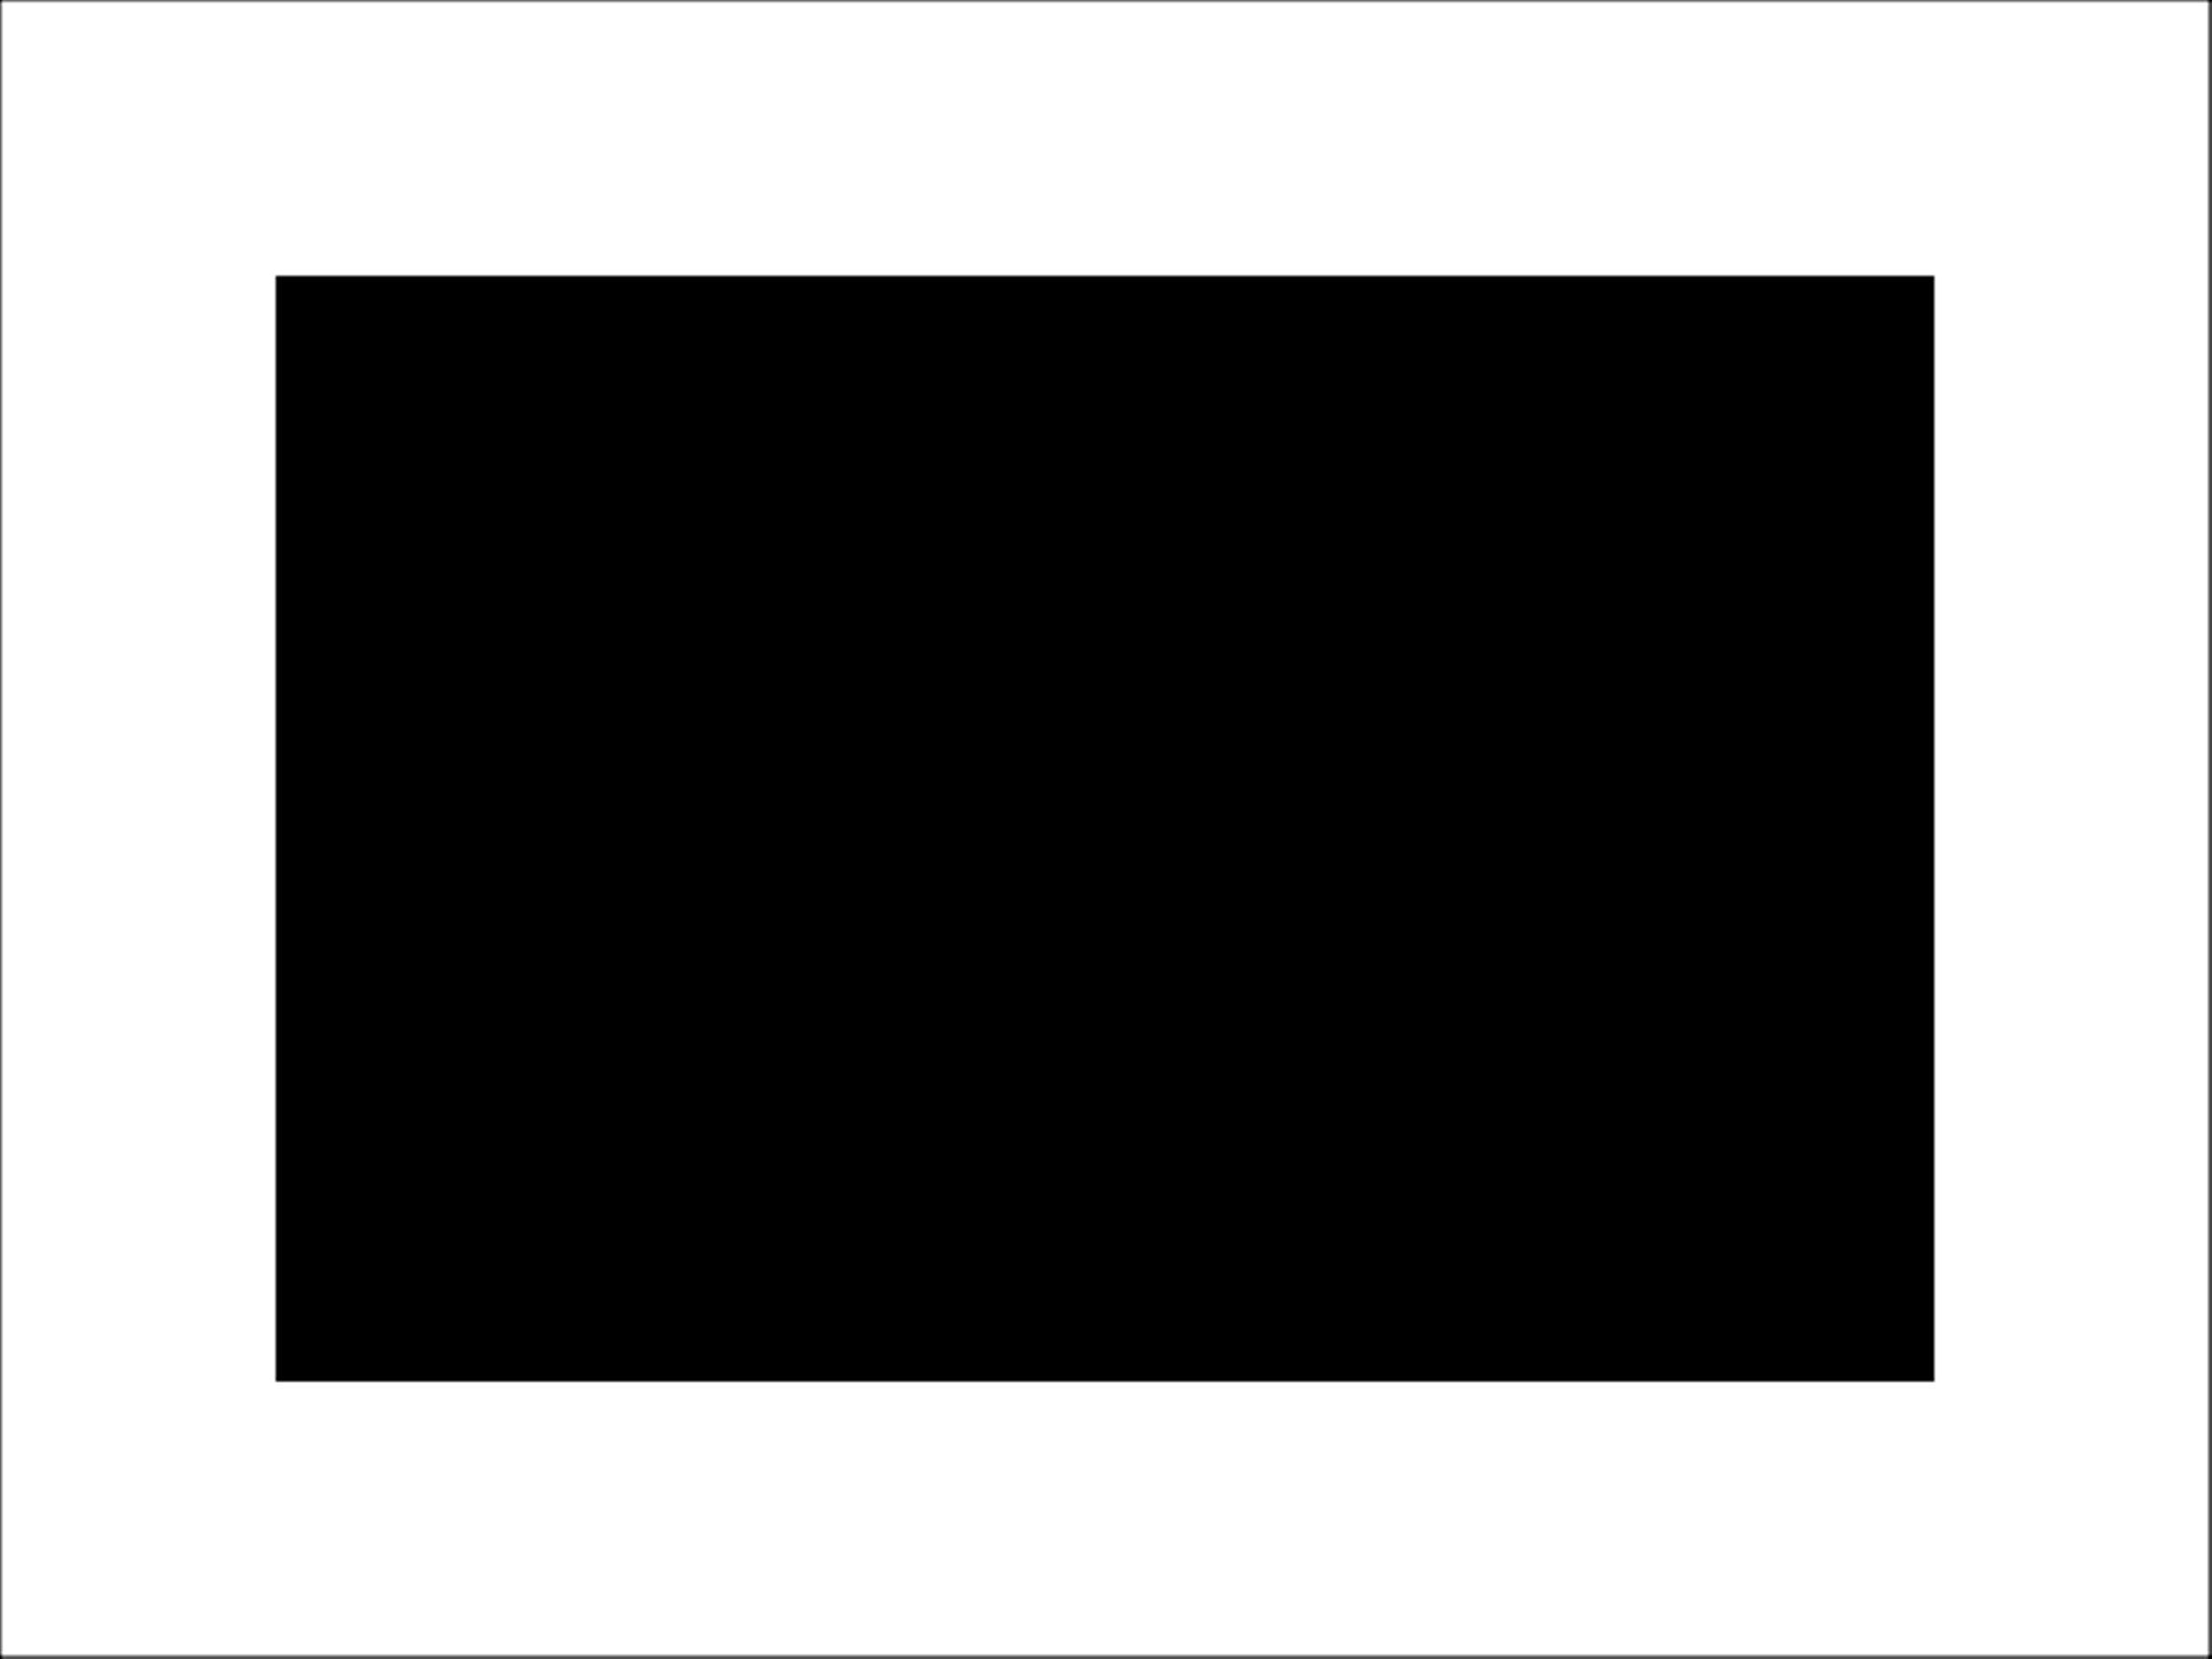 WAC Lighting ME-826-BK Surface Mount Directional Spot Light with Electronic Transformer, Black